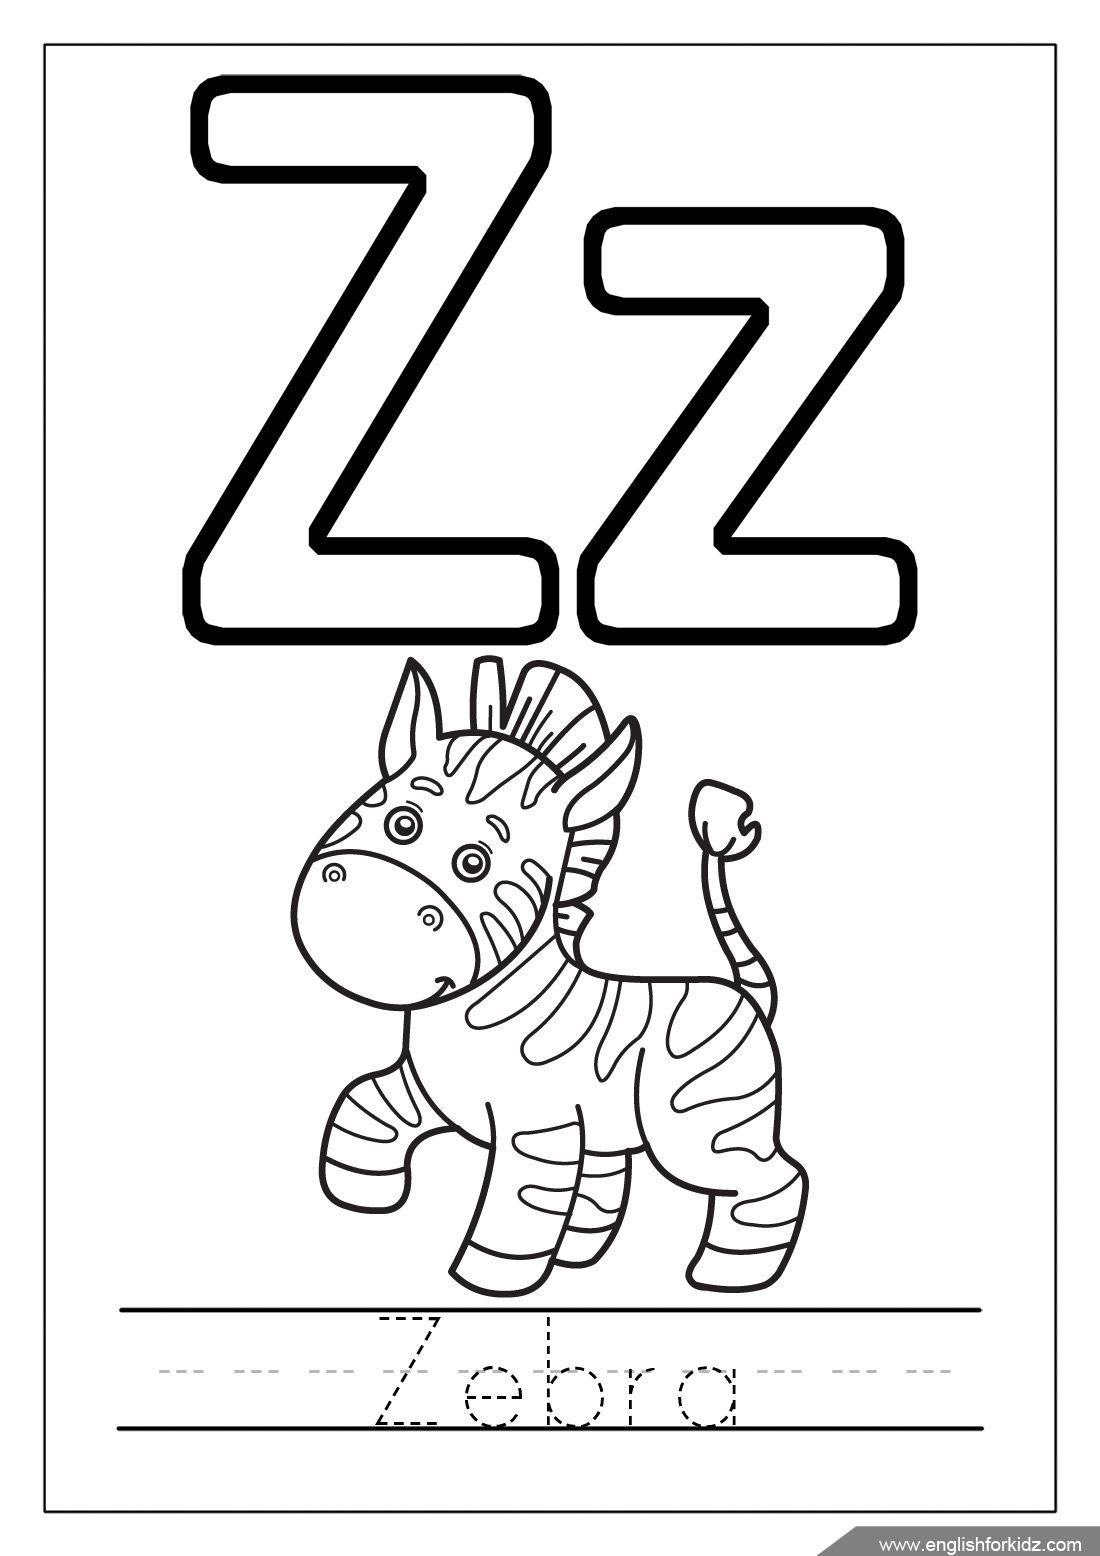 Alphabet Coloring Page Letter Z Coloring Zebra Coloring